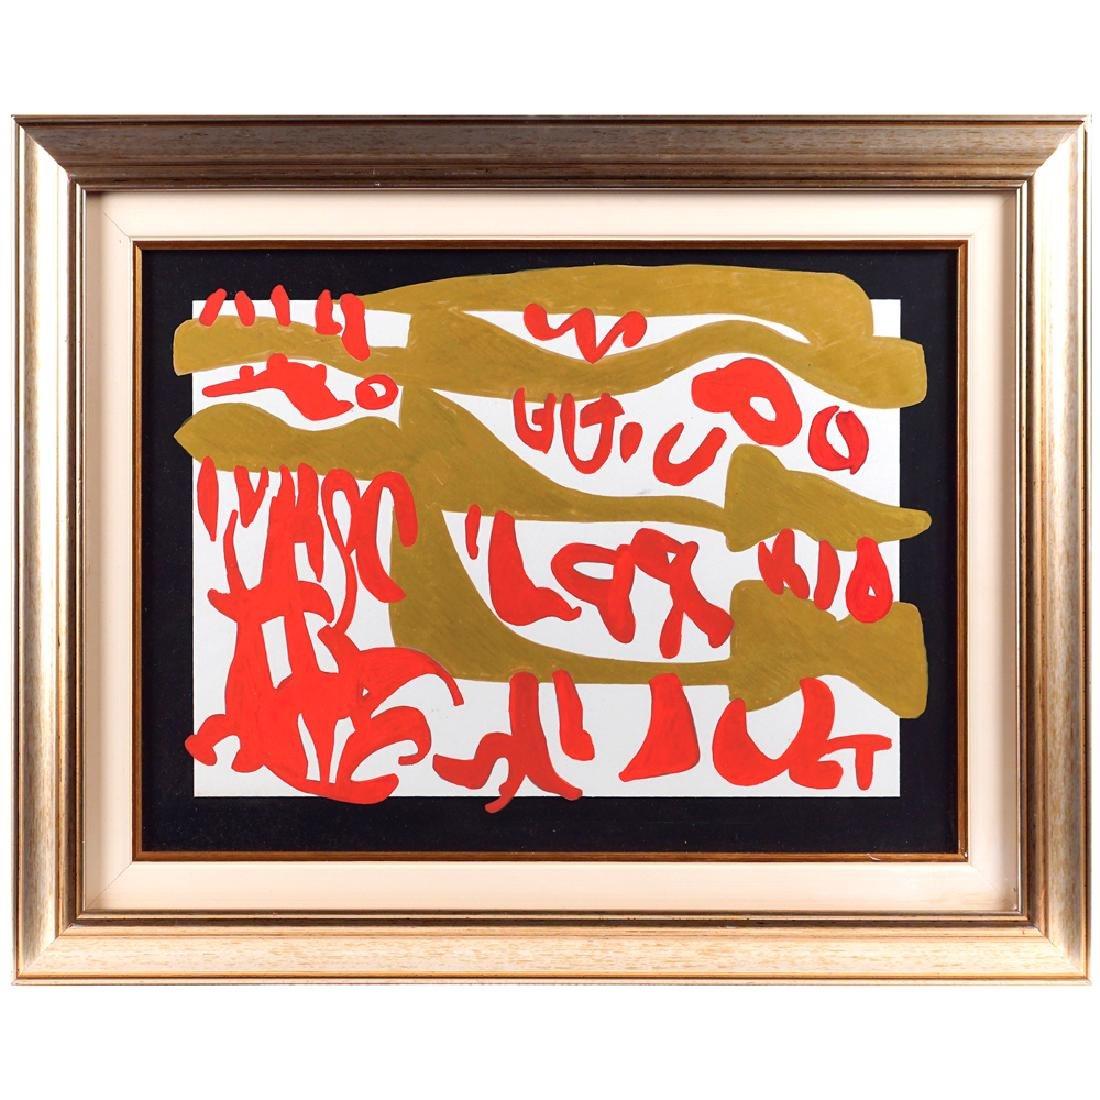 Carla Accardi Trapani 1924 - Roma 2014 32.5x44 cm.